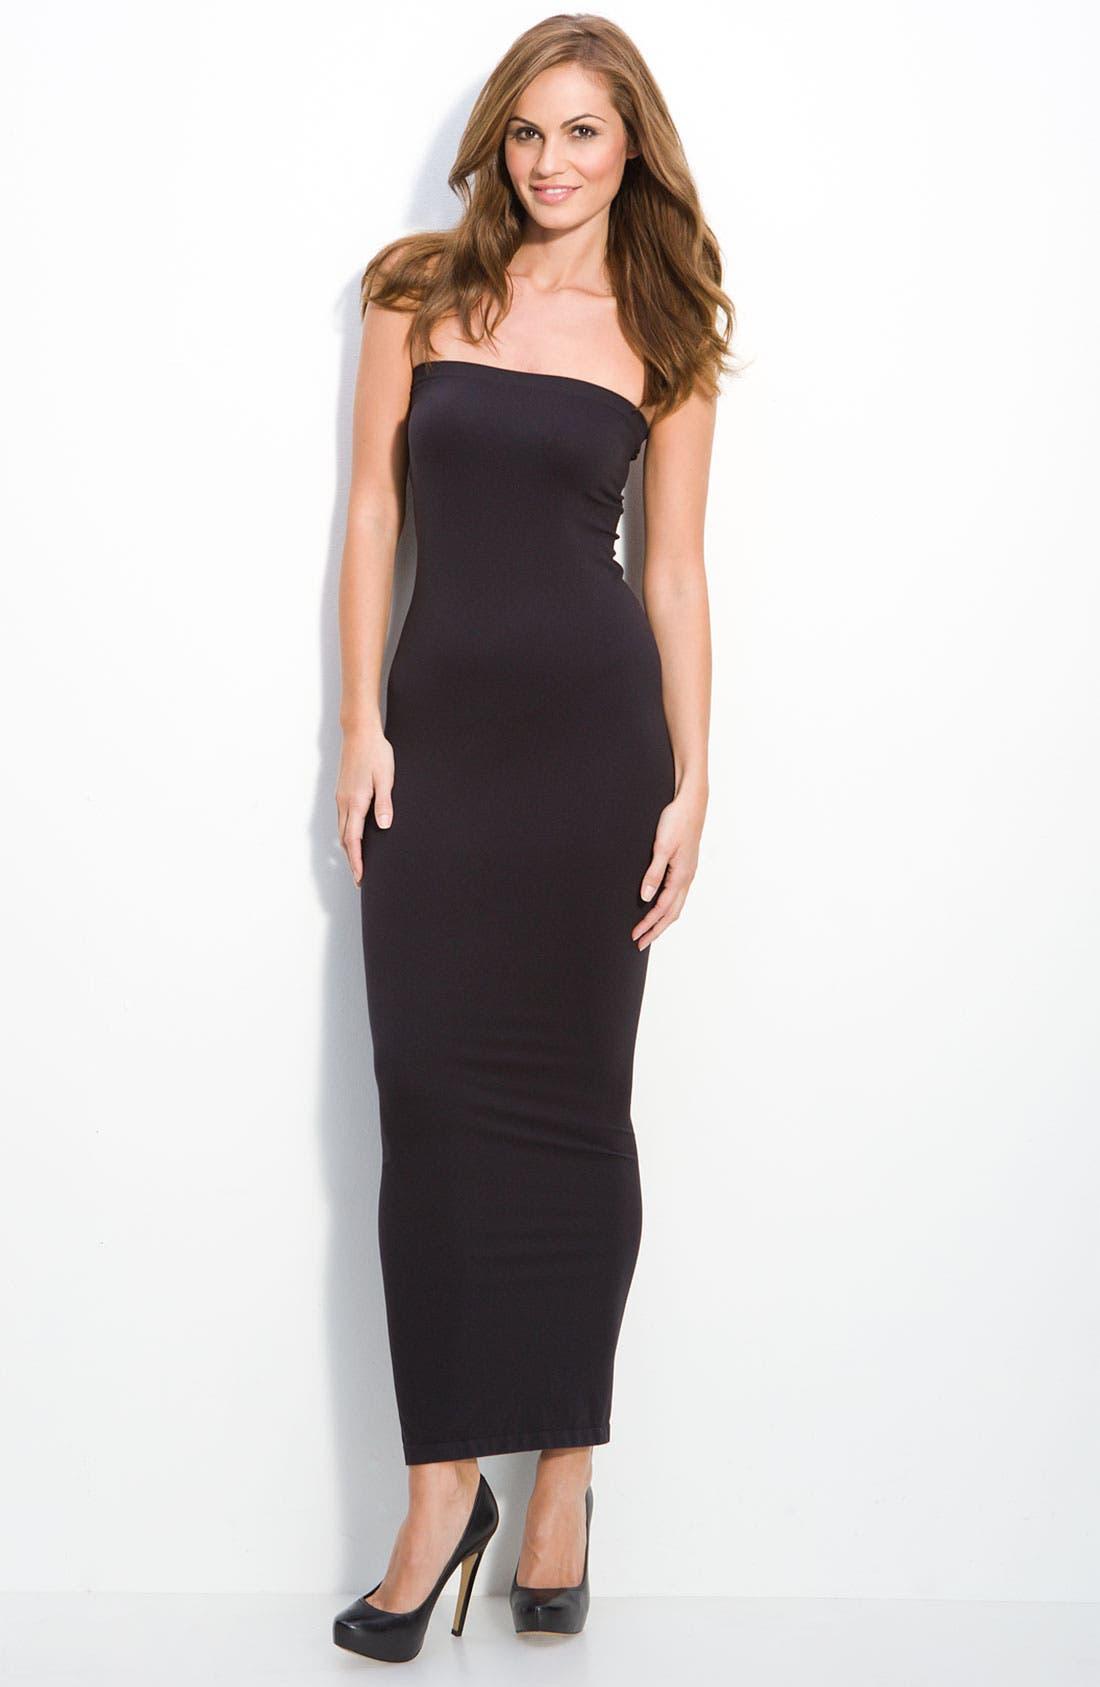 Wolford 'Fatal' Tube Dress